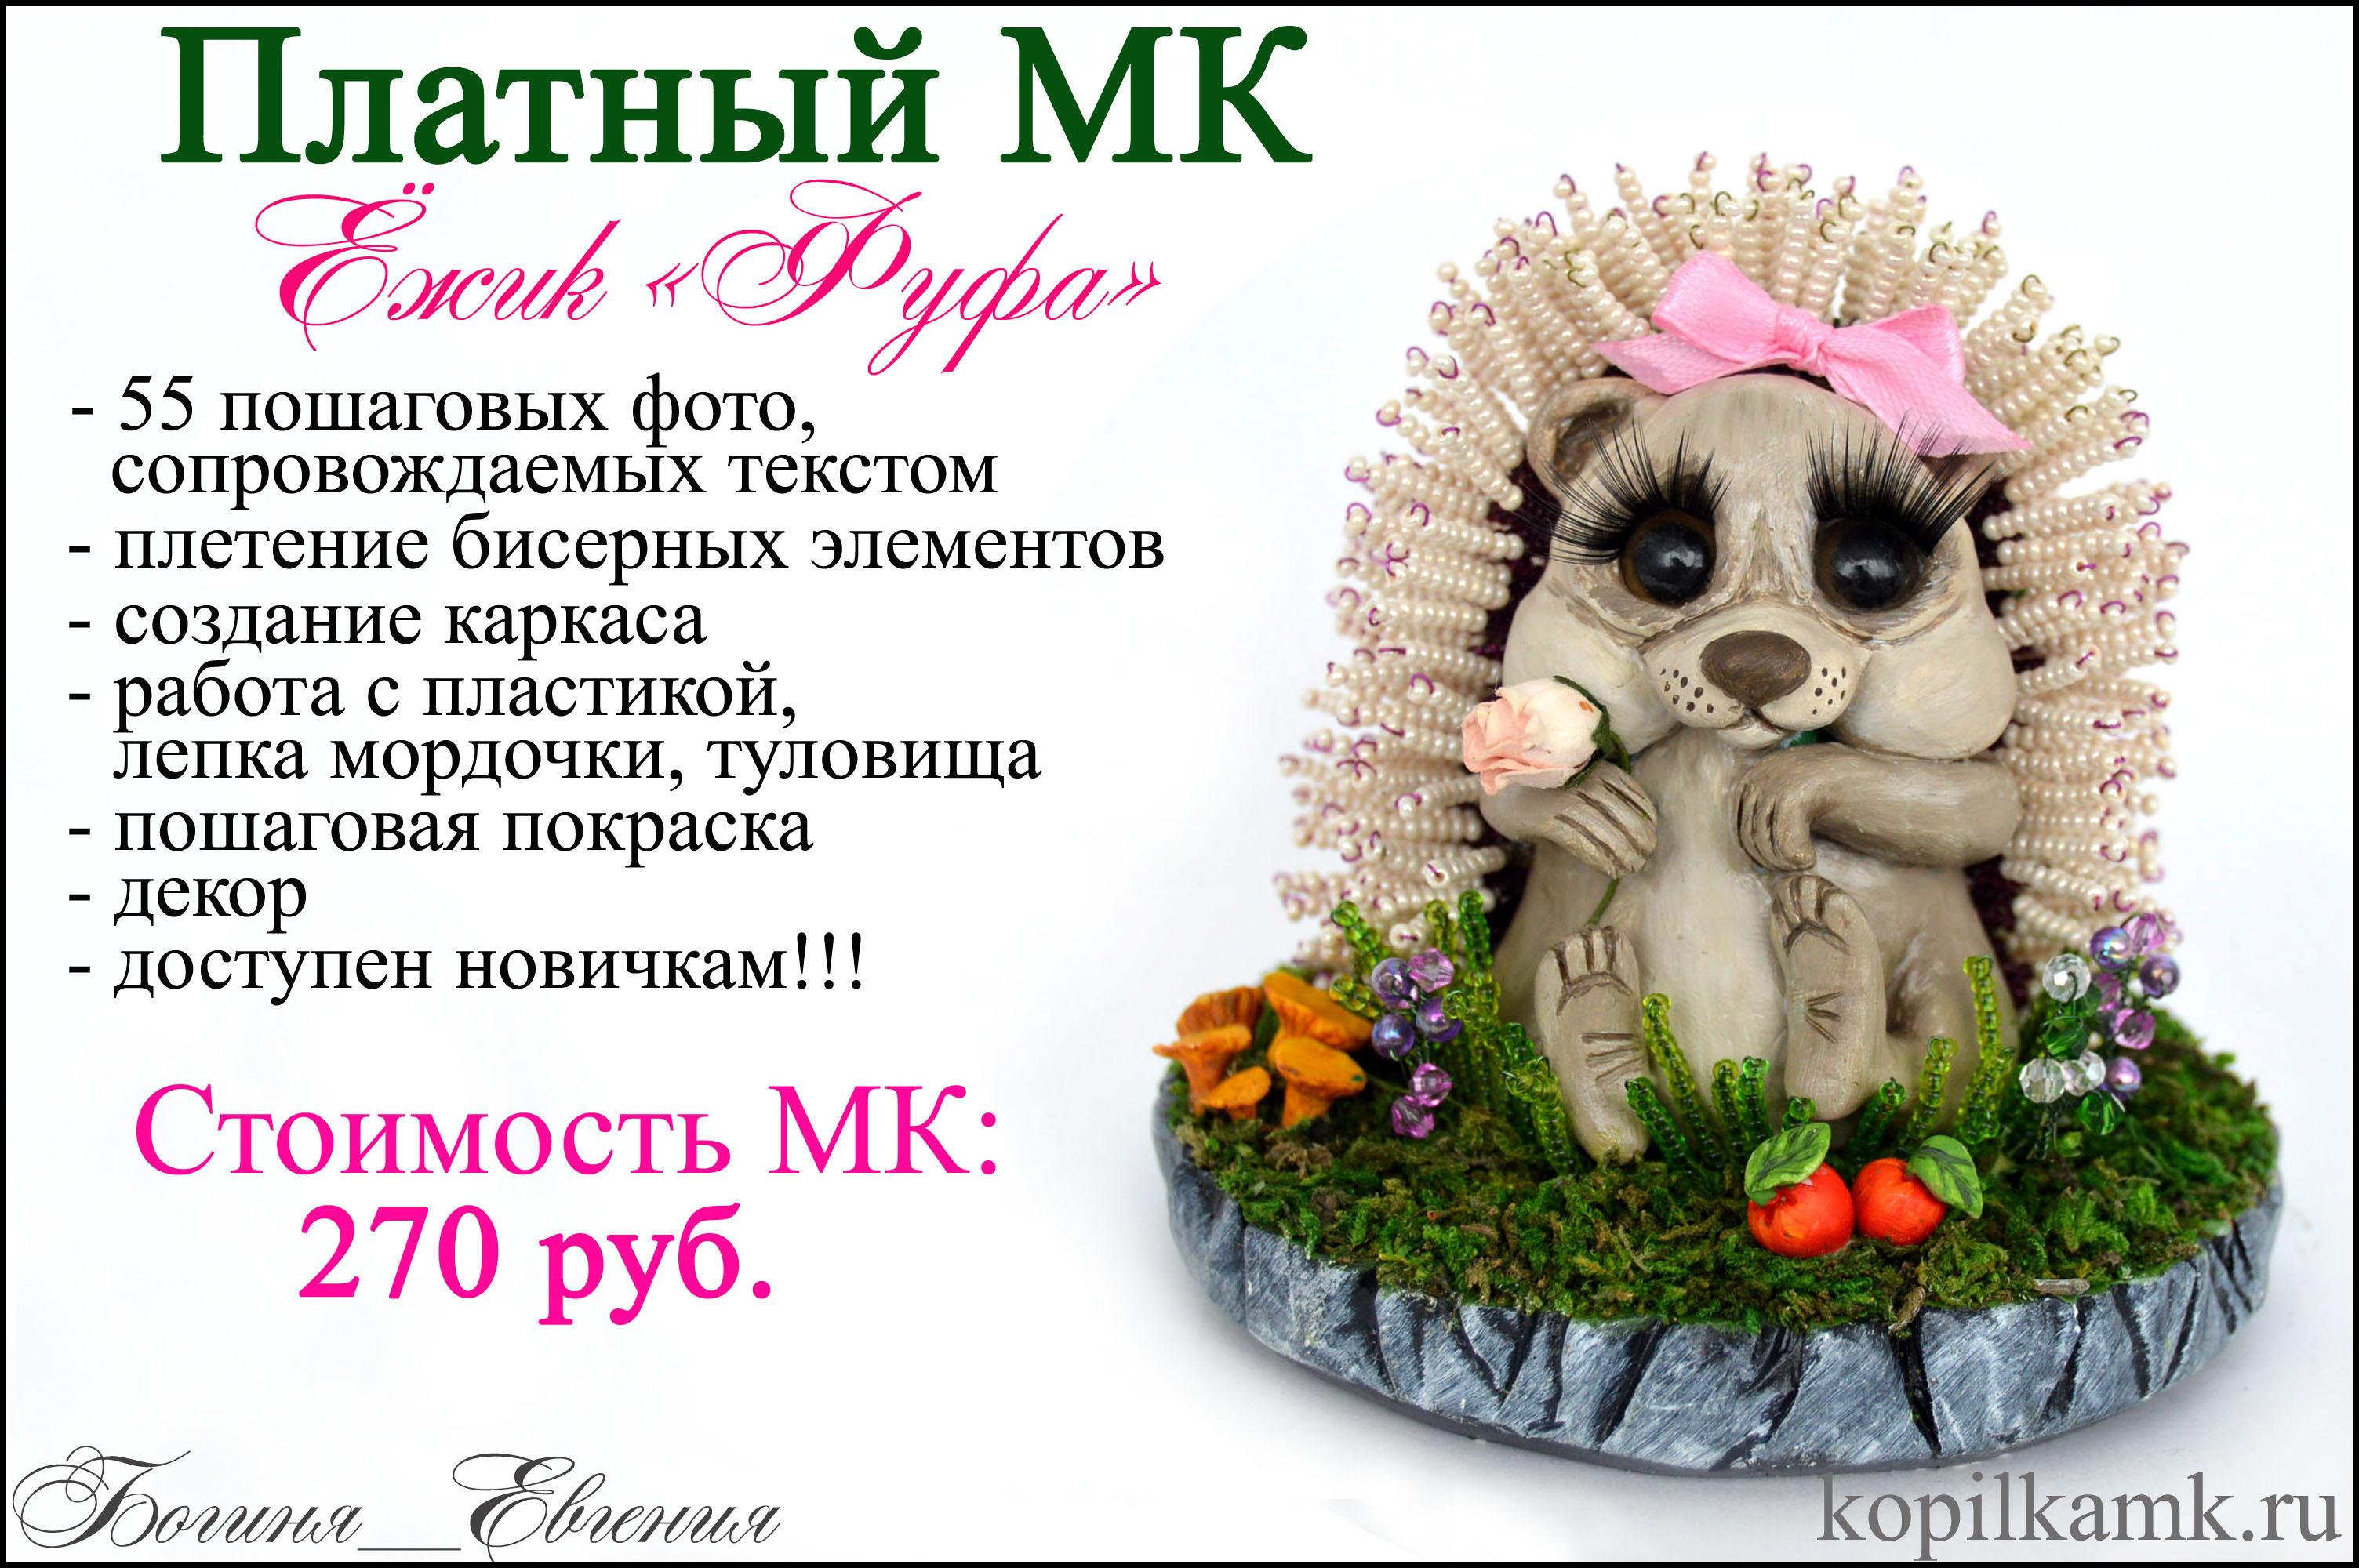 platnyj-mk